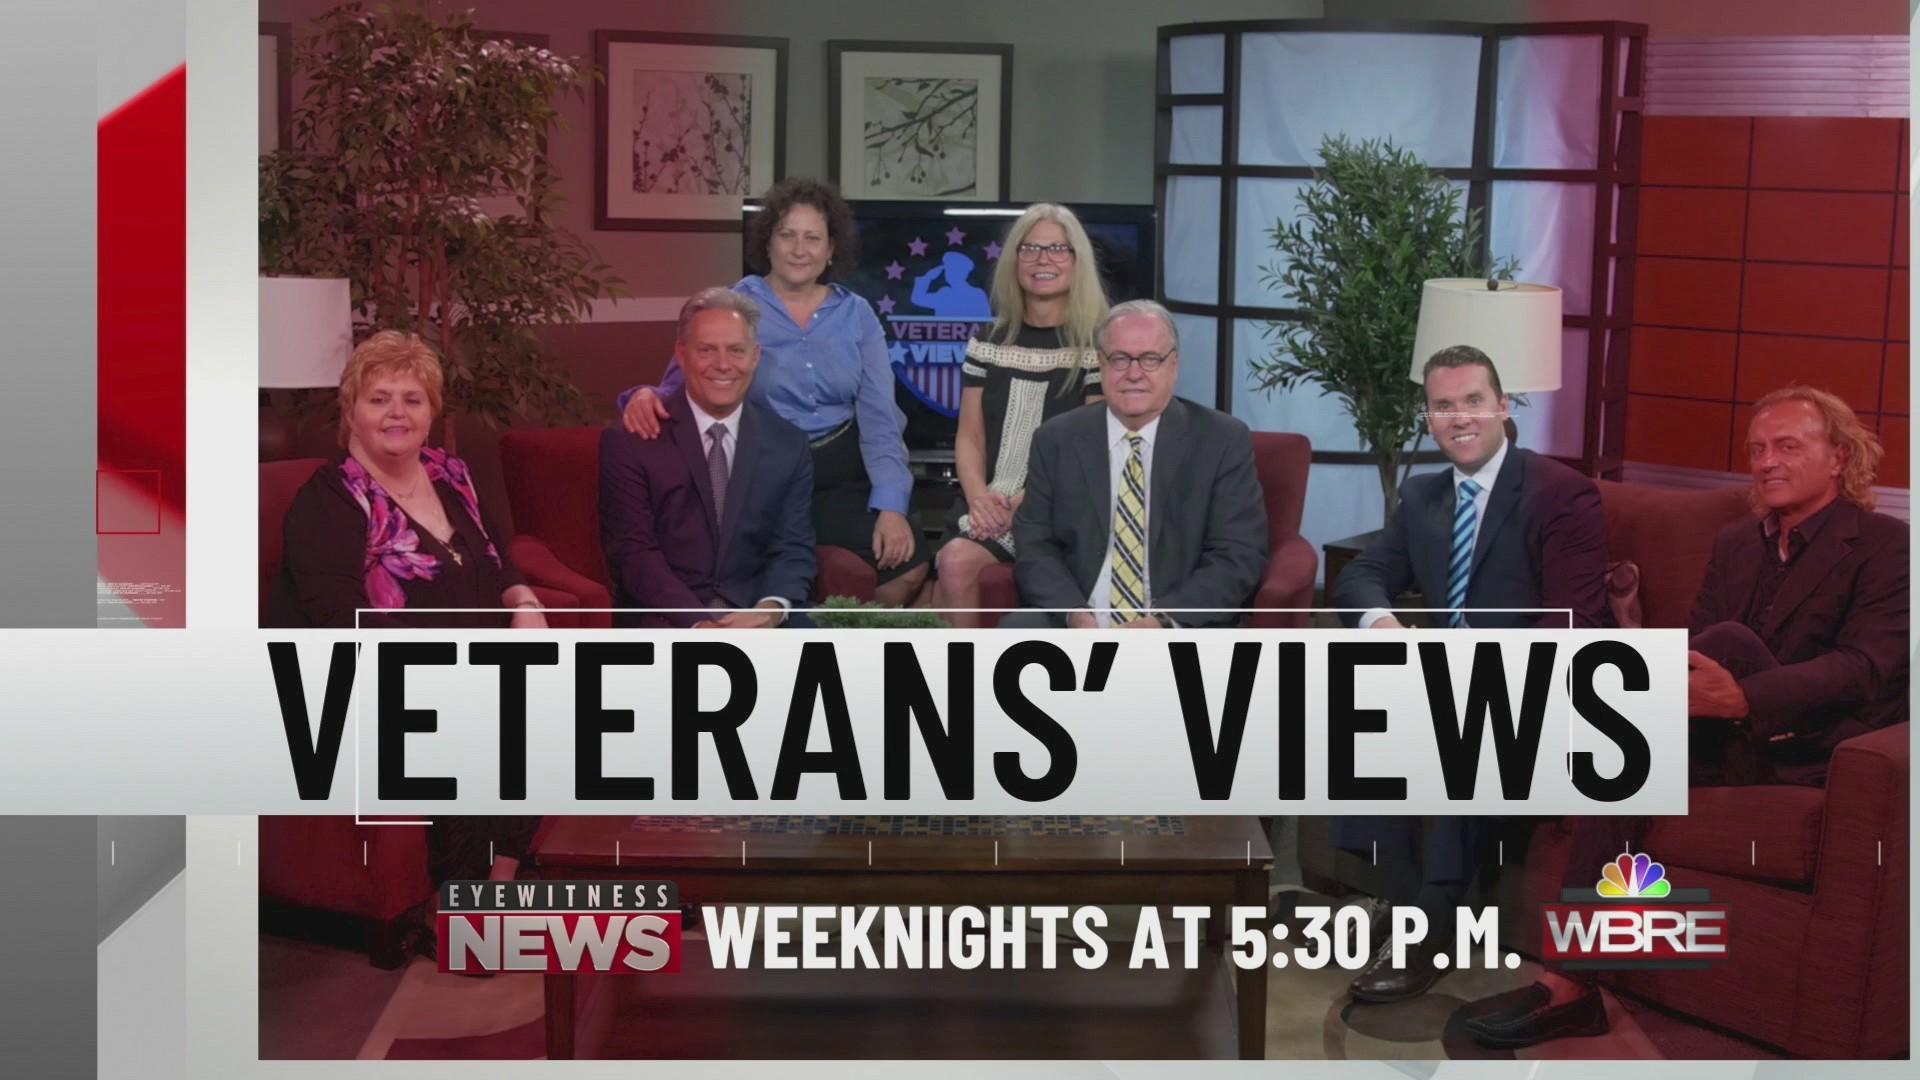 Veterans_Views_Promo_0_20190311170157